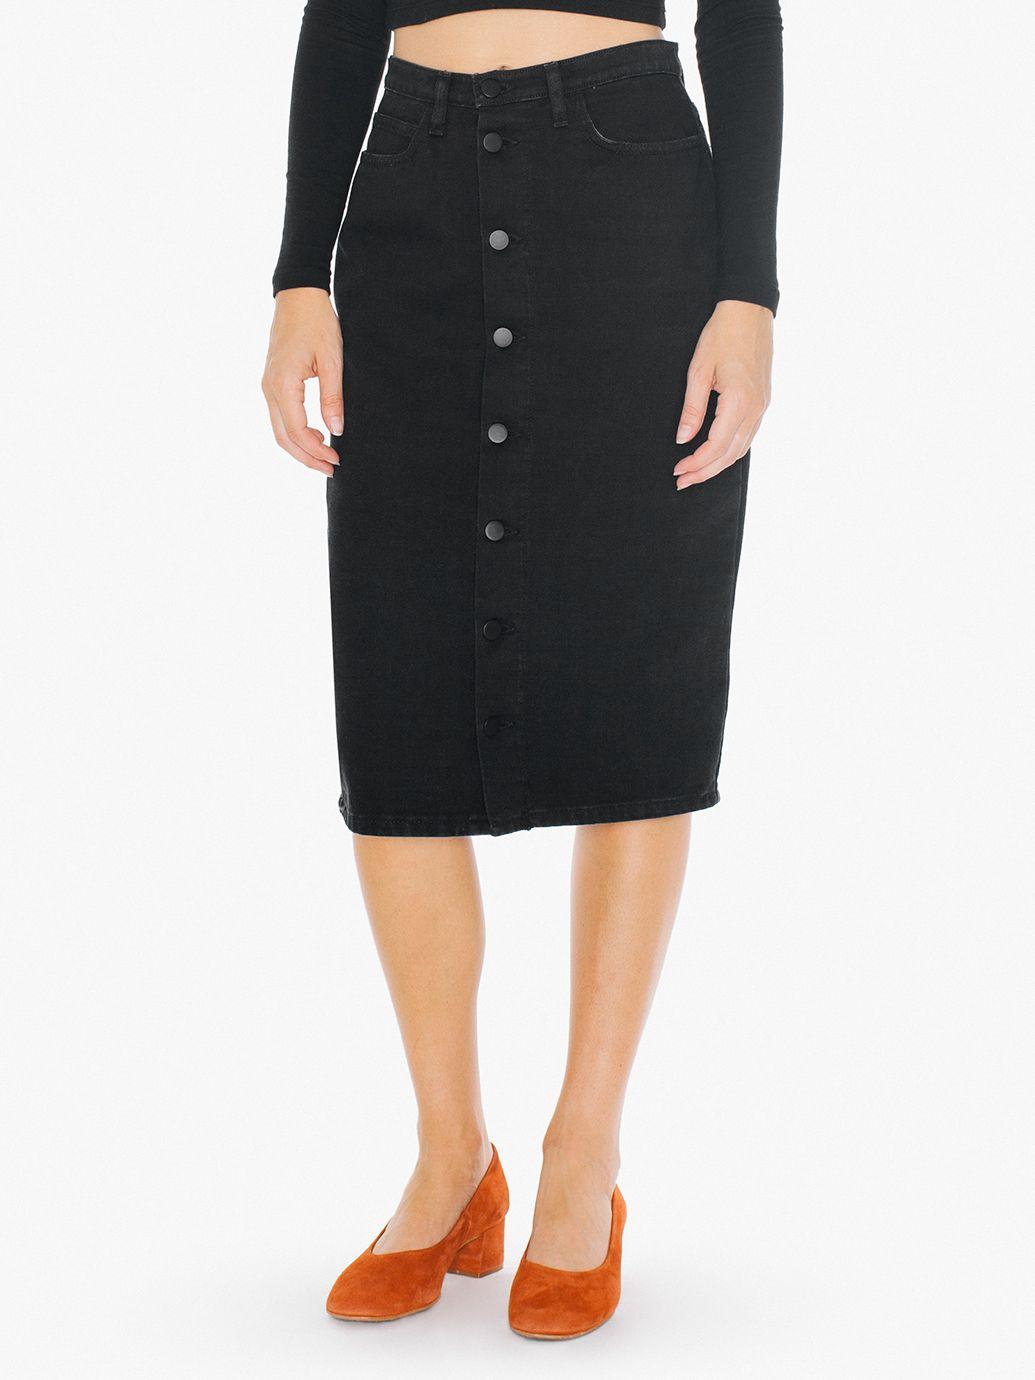 Black Denim Button Front Skirt - Dress Ala